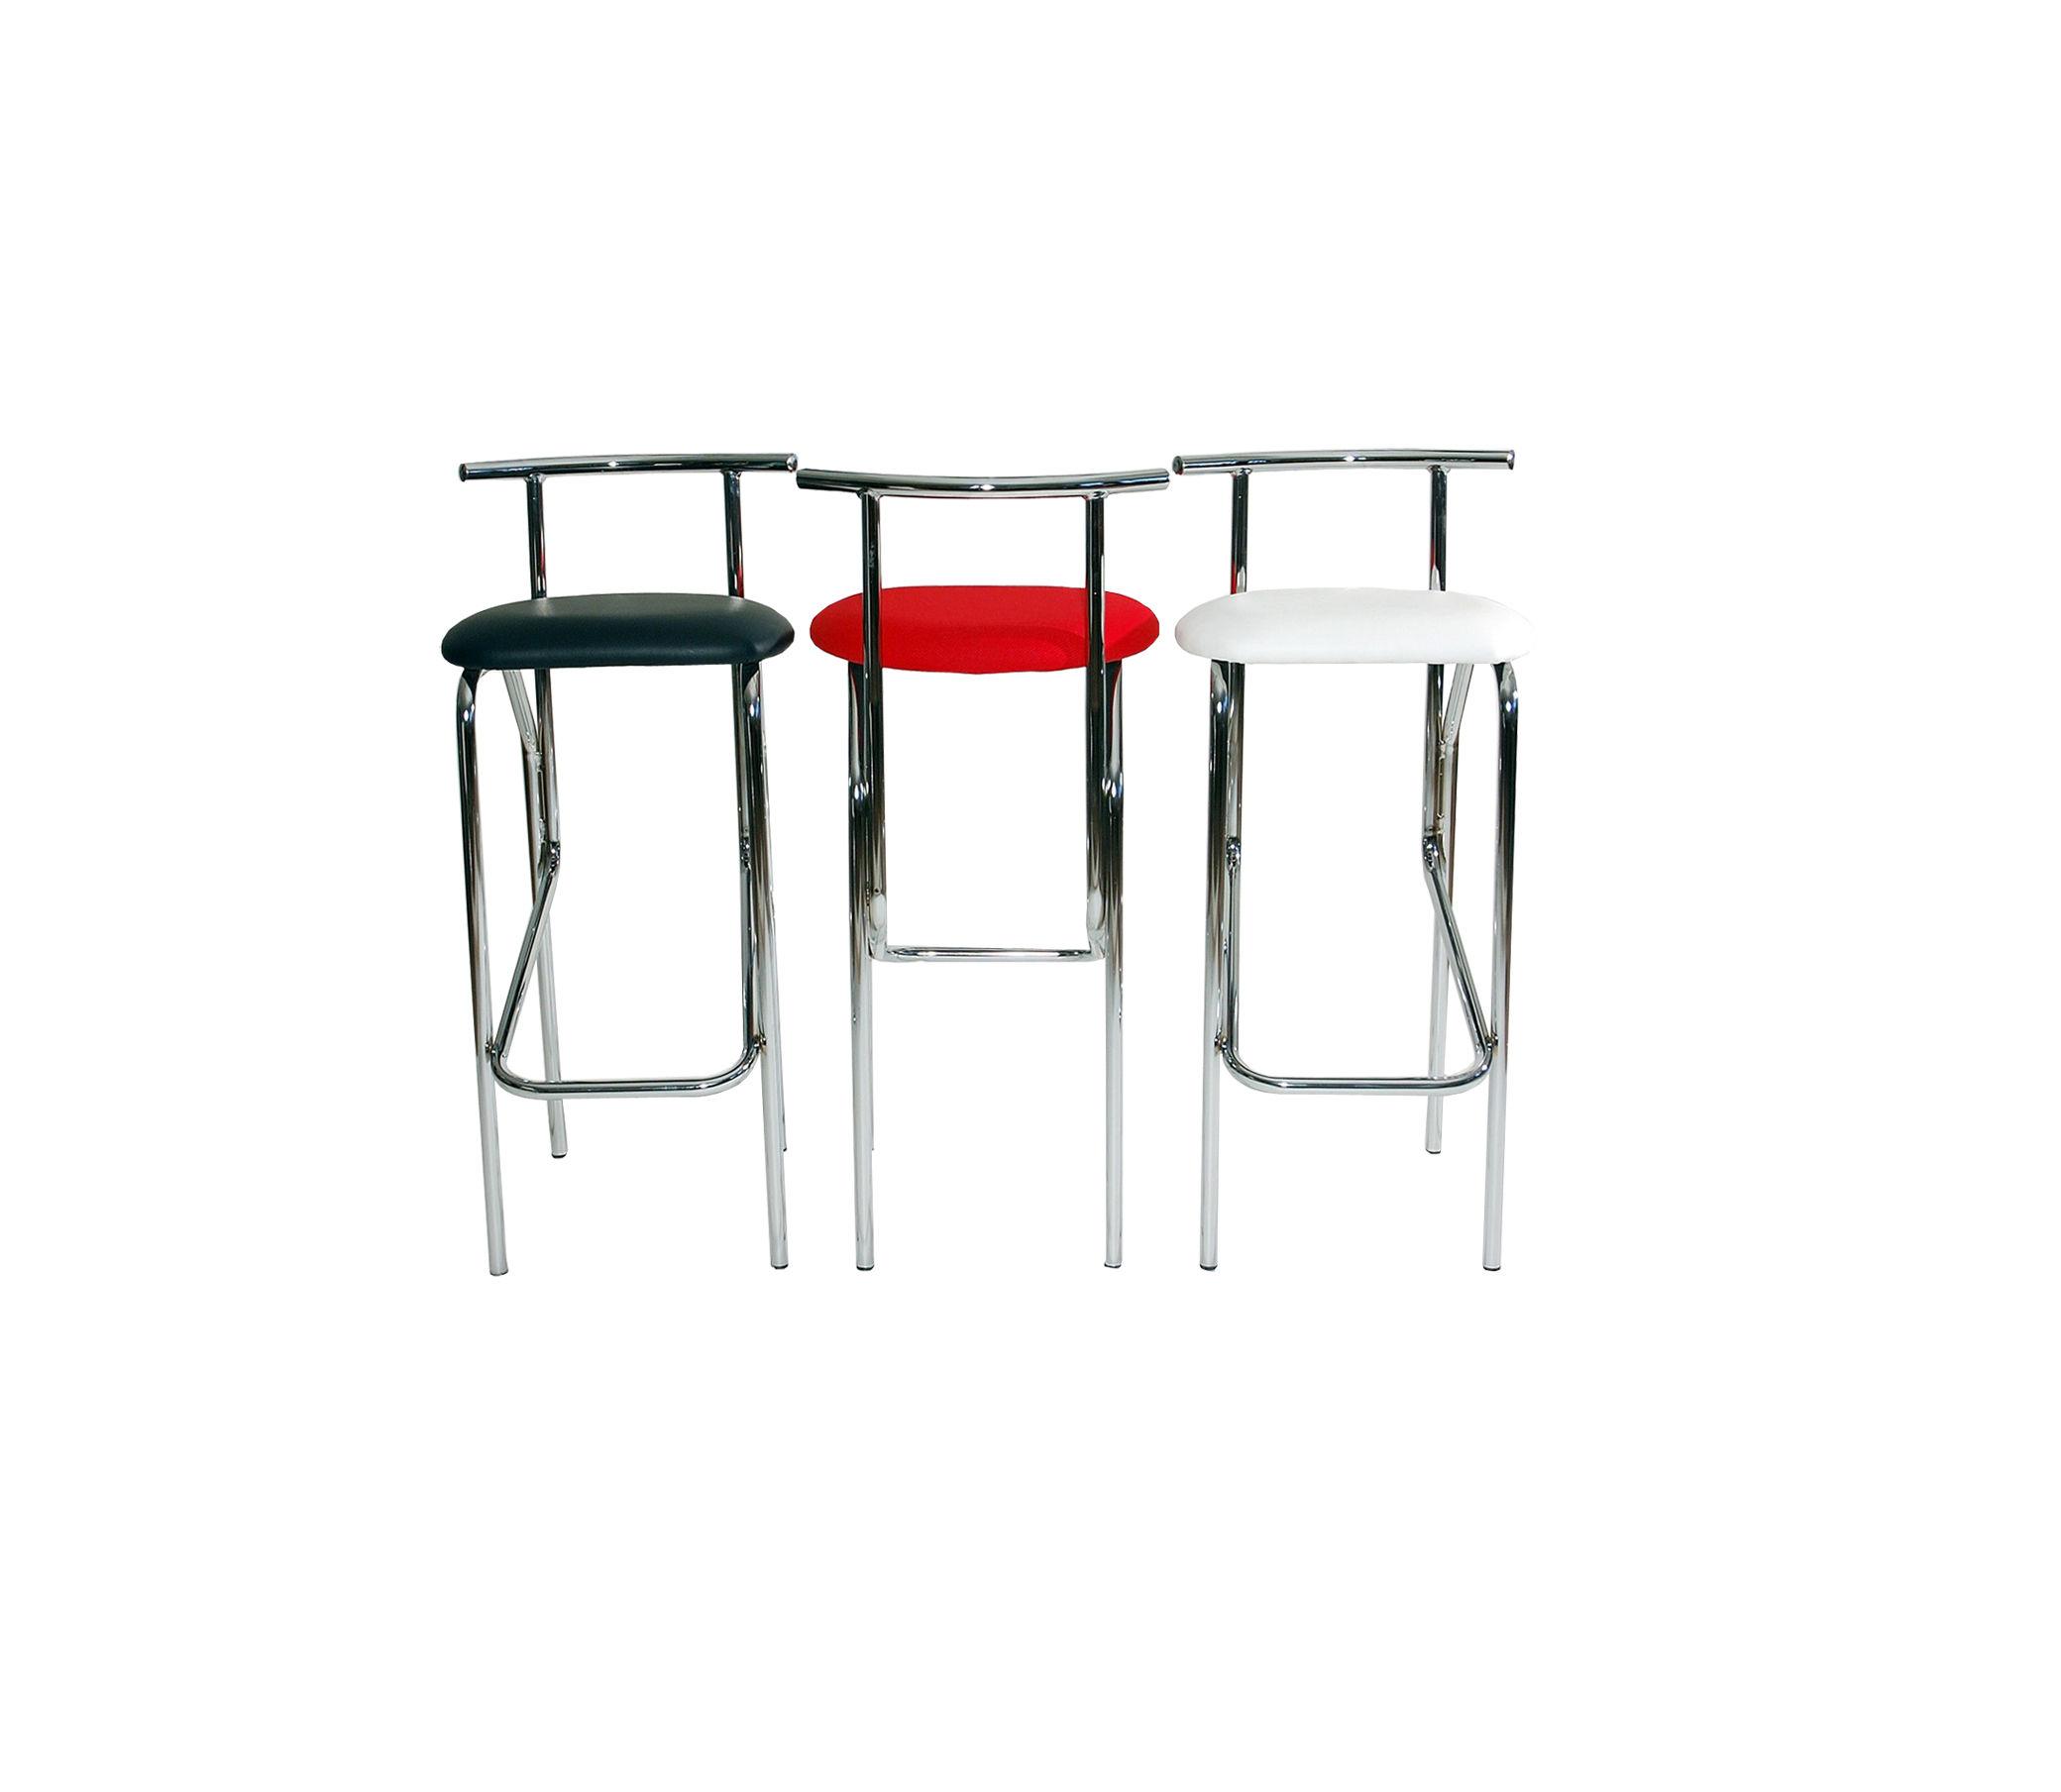 Luna alquiler de mobiliario de stuhl ib rica alquiler de for Alquiler de mobiliario de oficina